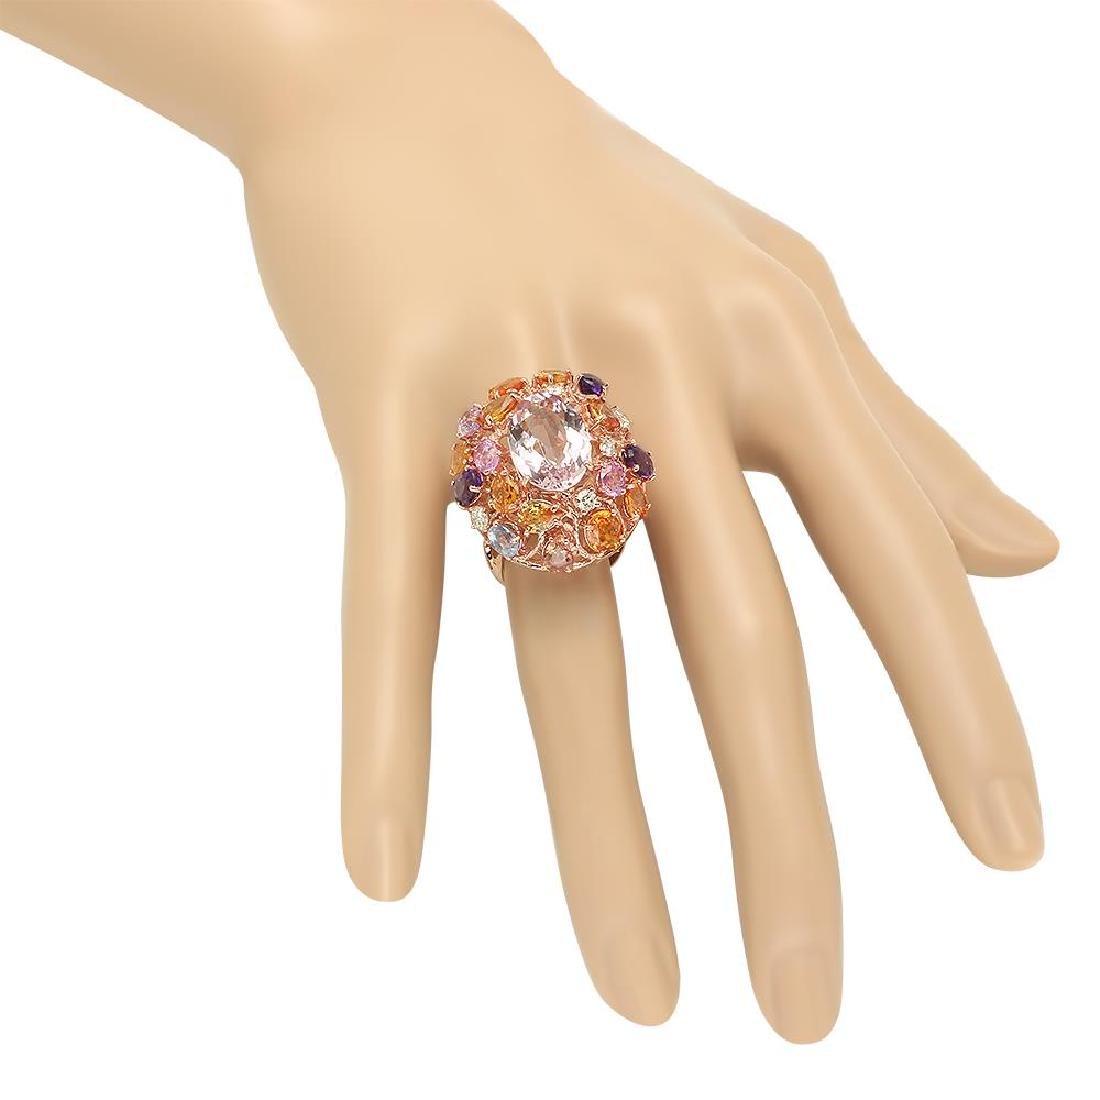 14K Gold 7.32ct Morganite 5.96ct Amethyst, Sapphire - 3